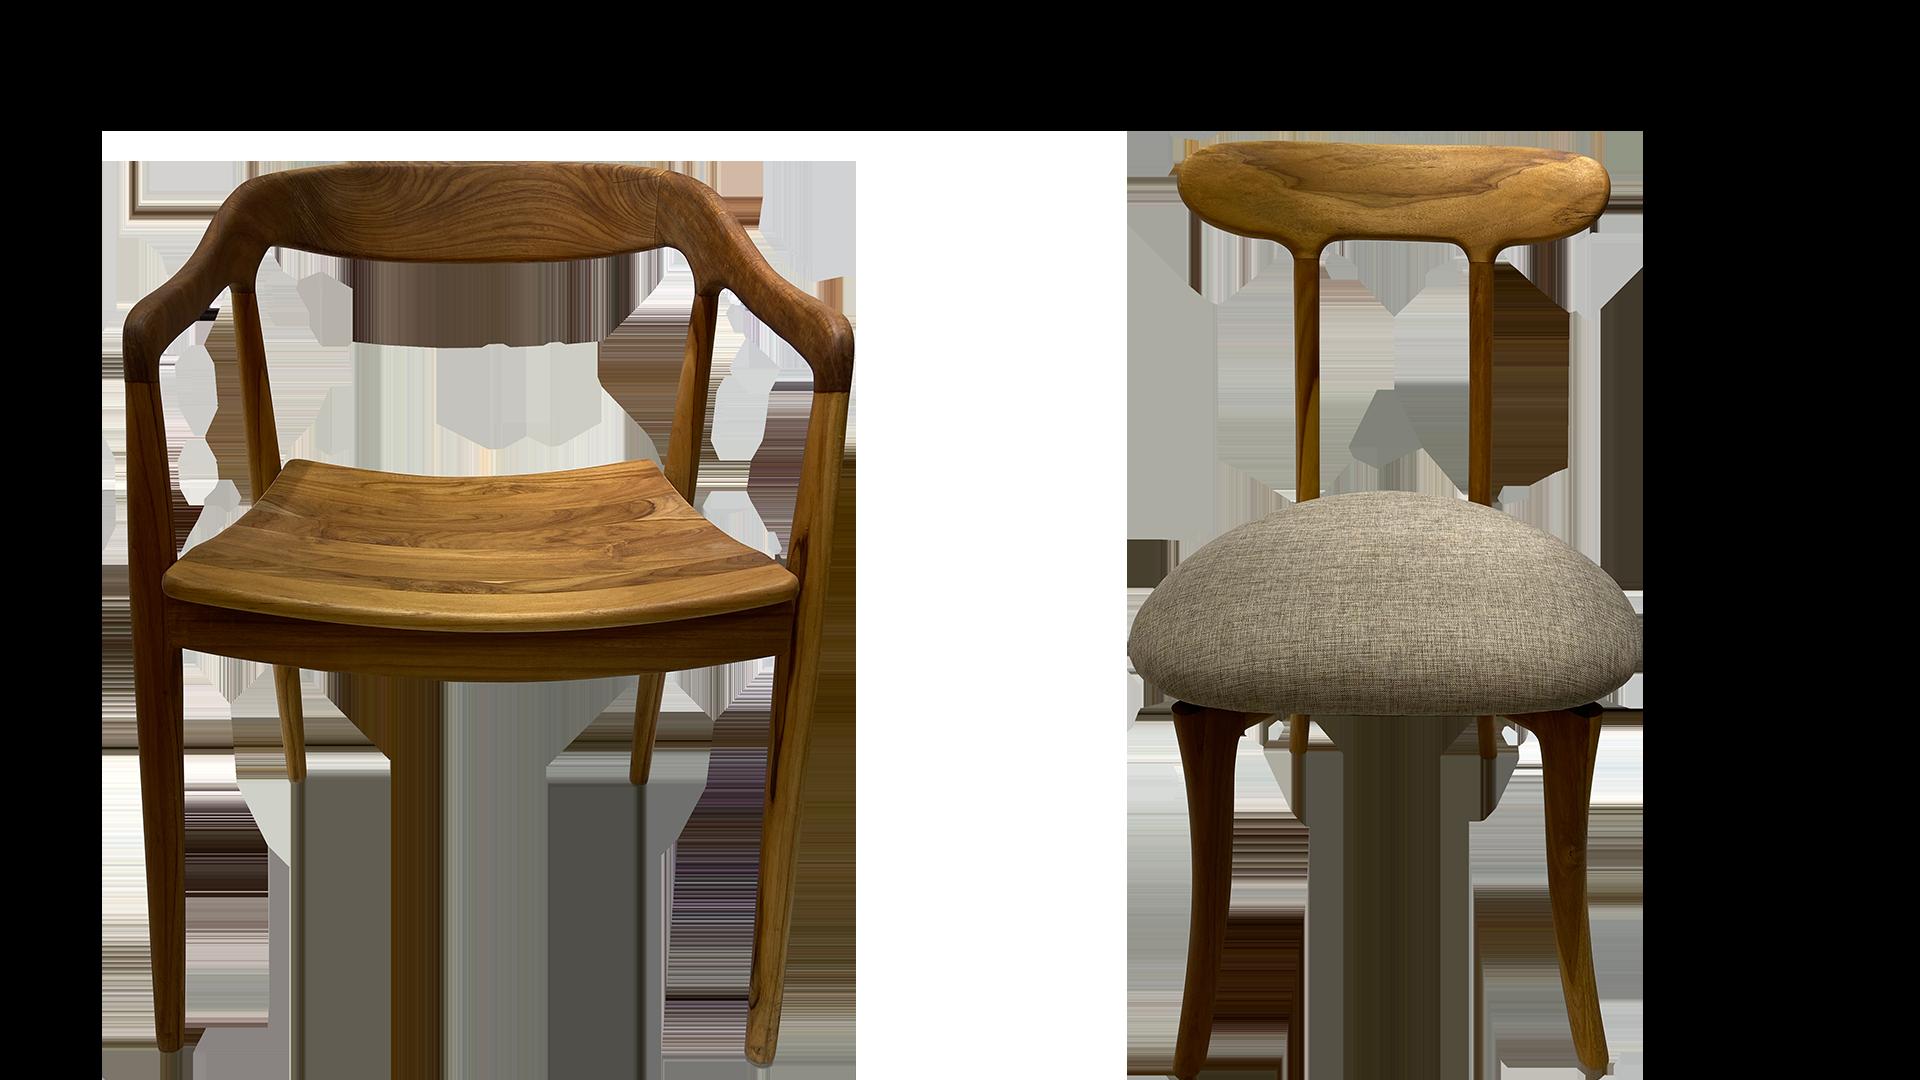 jatiのダイニングチェア。チークウッドを使用した食卓椅子。